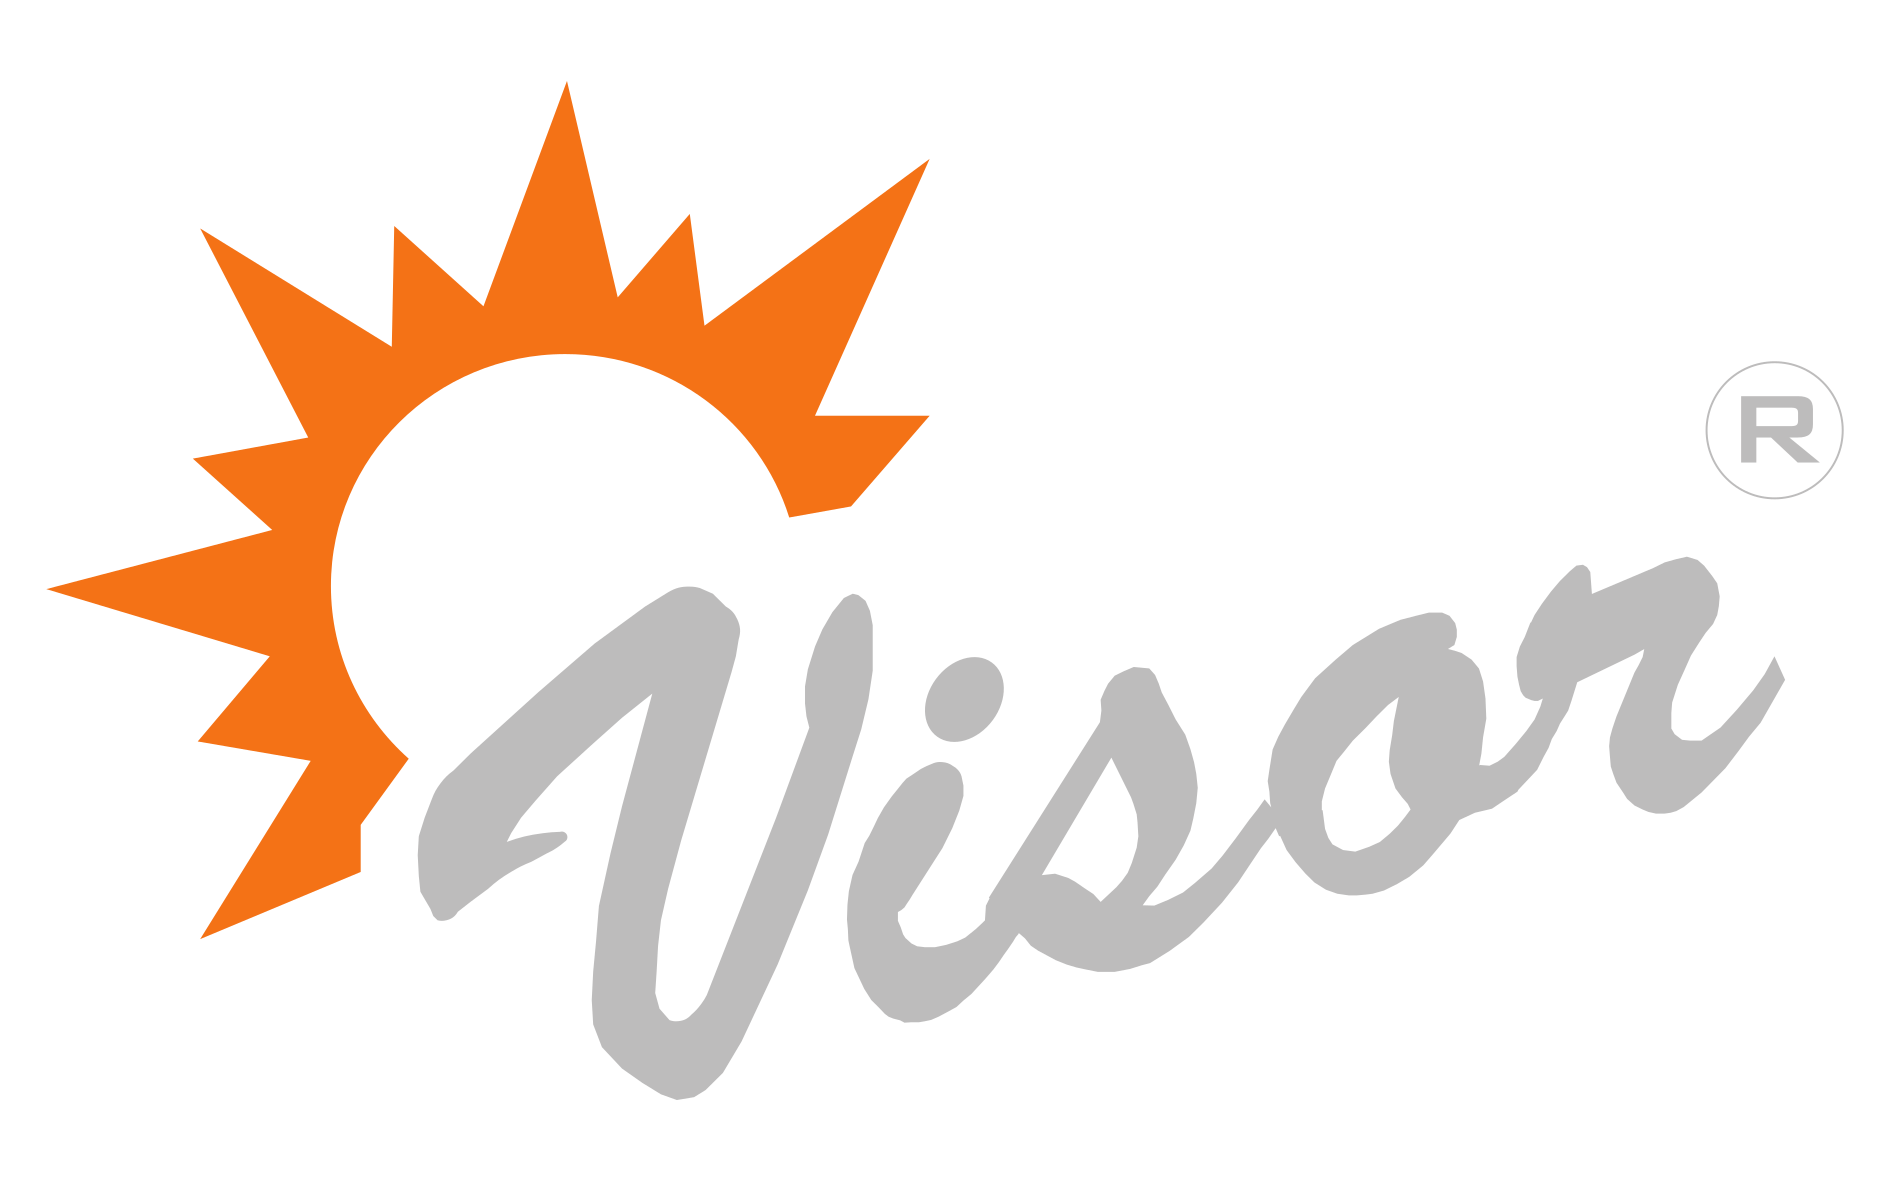 Suomen Visor Oy